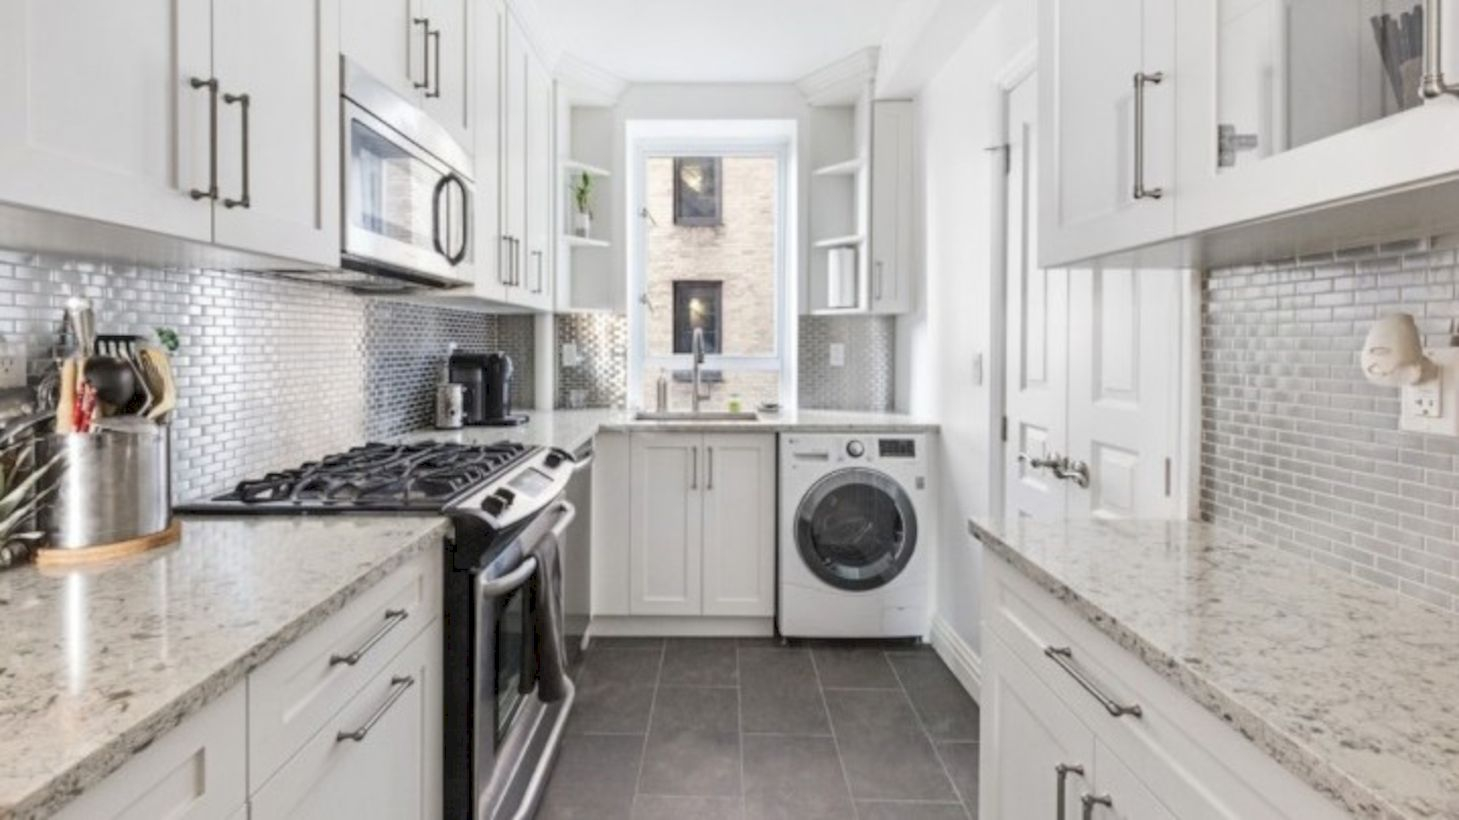 51 Inspiring Small Laundry Room Design Ideas In Spring